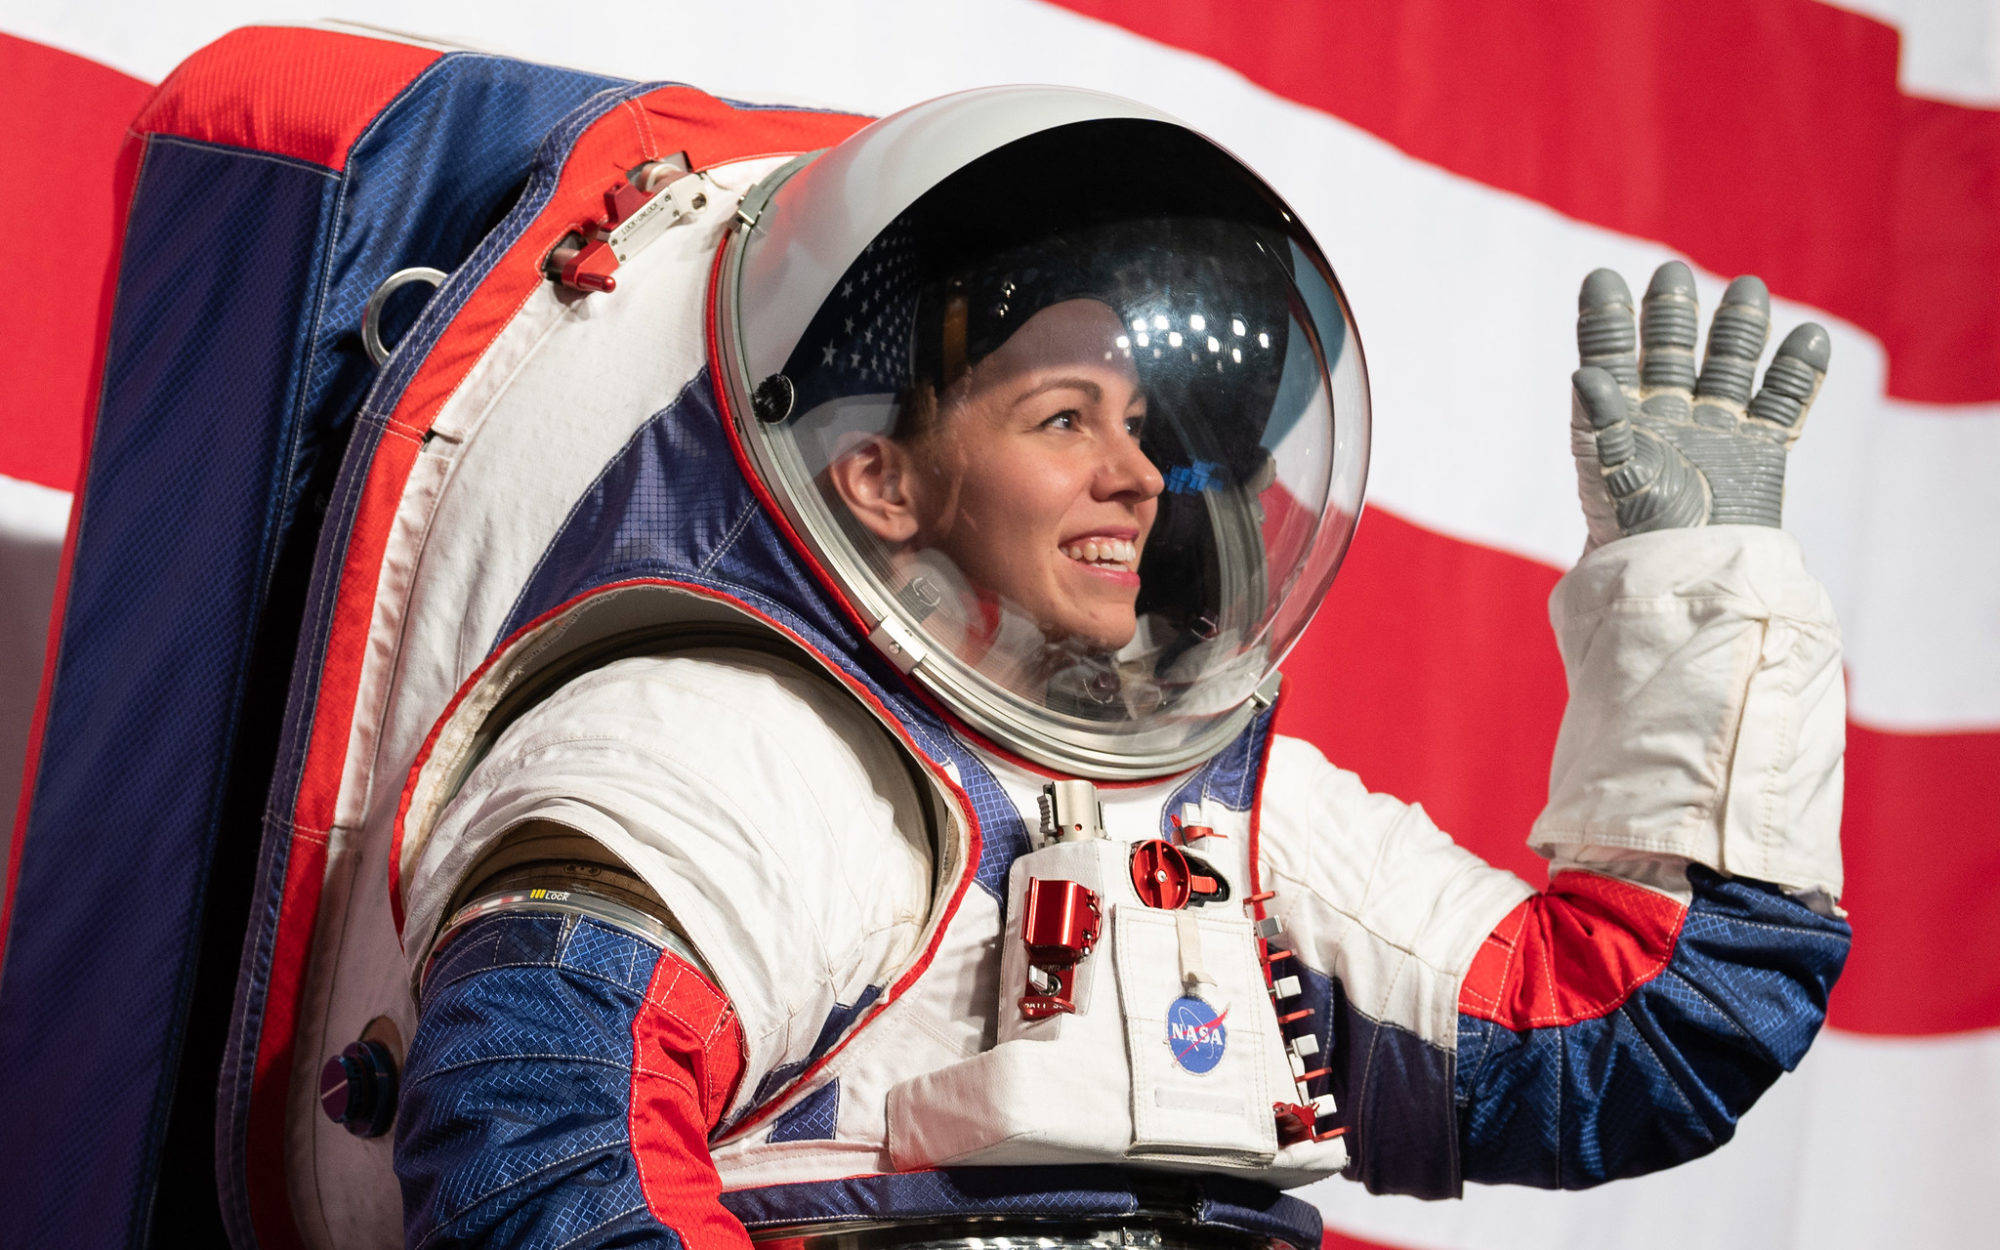 NASA влаштувало показ місячної моди (ФОТО) - космос, NASA - 16 skafandr3 2000x1250